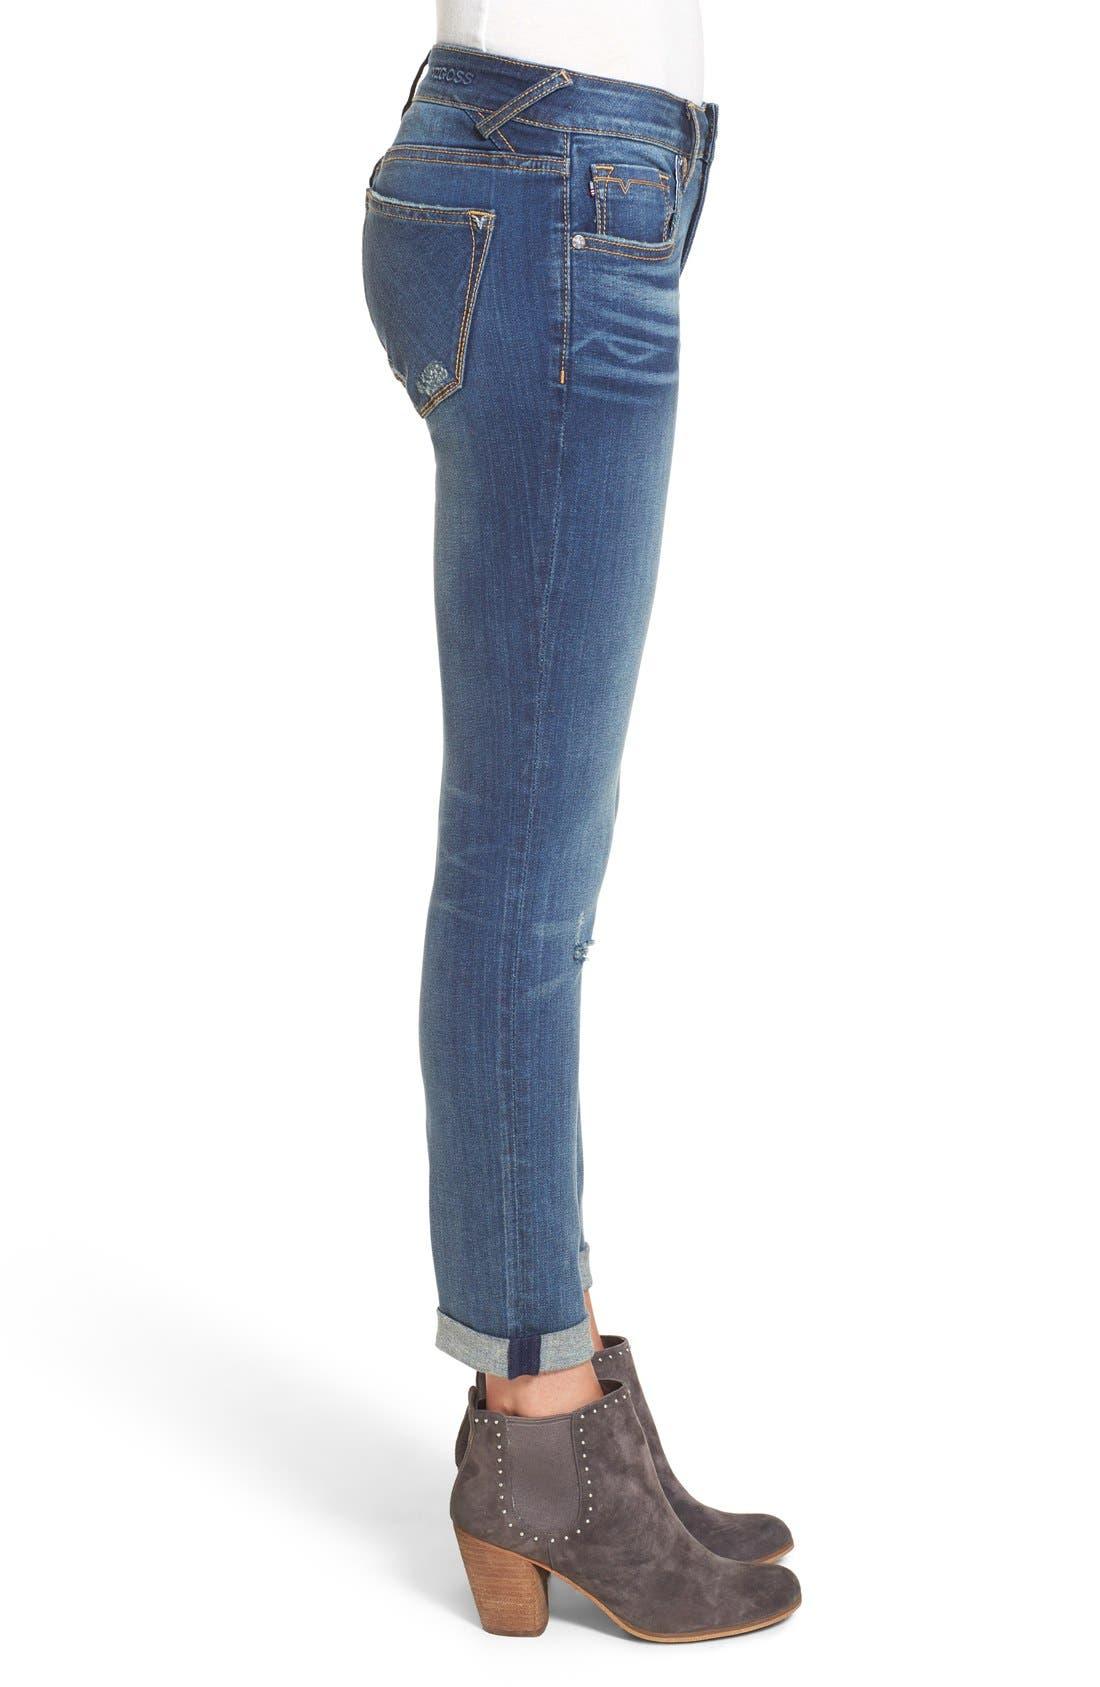 Alternate Image 3  - Vigoss 'Thompson' Distressed Skinny Jeans (Neptune)